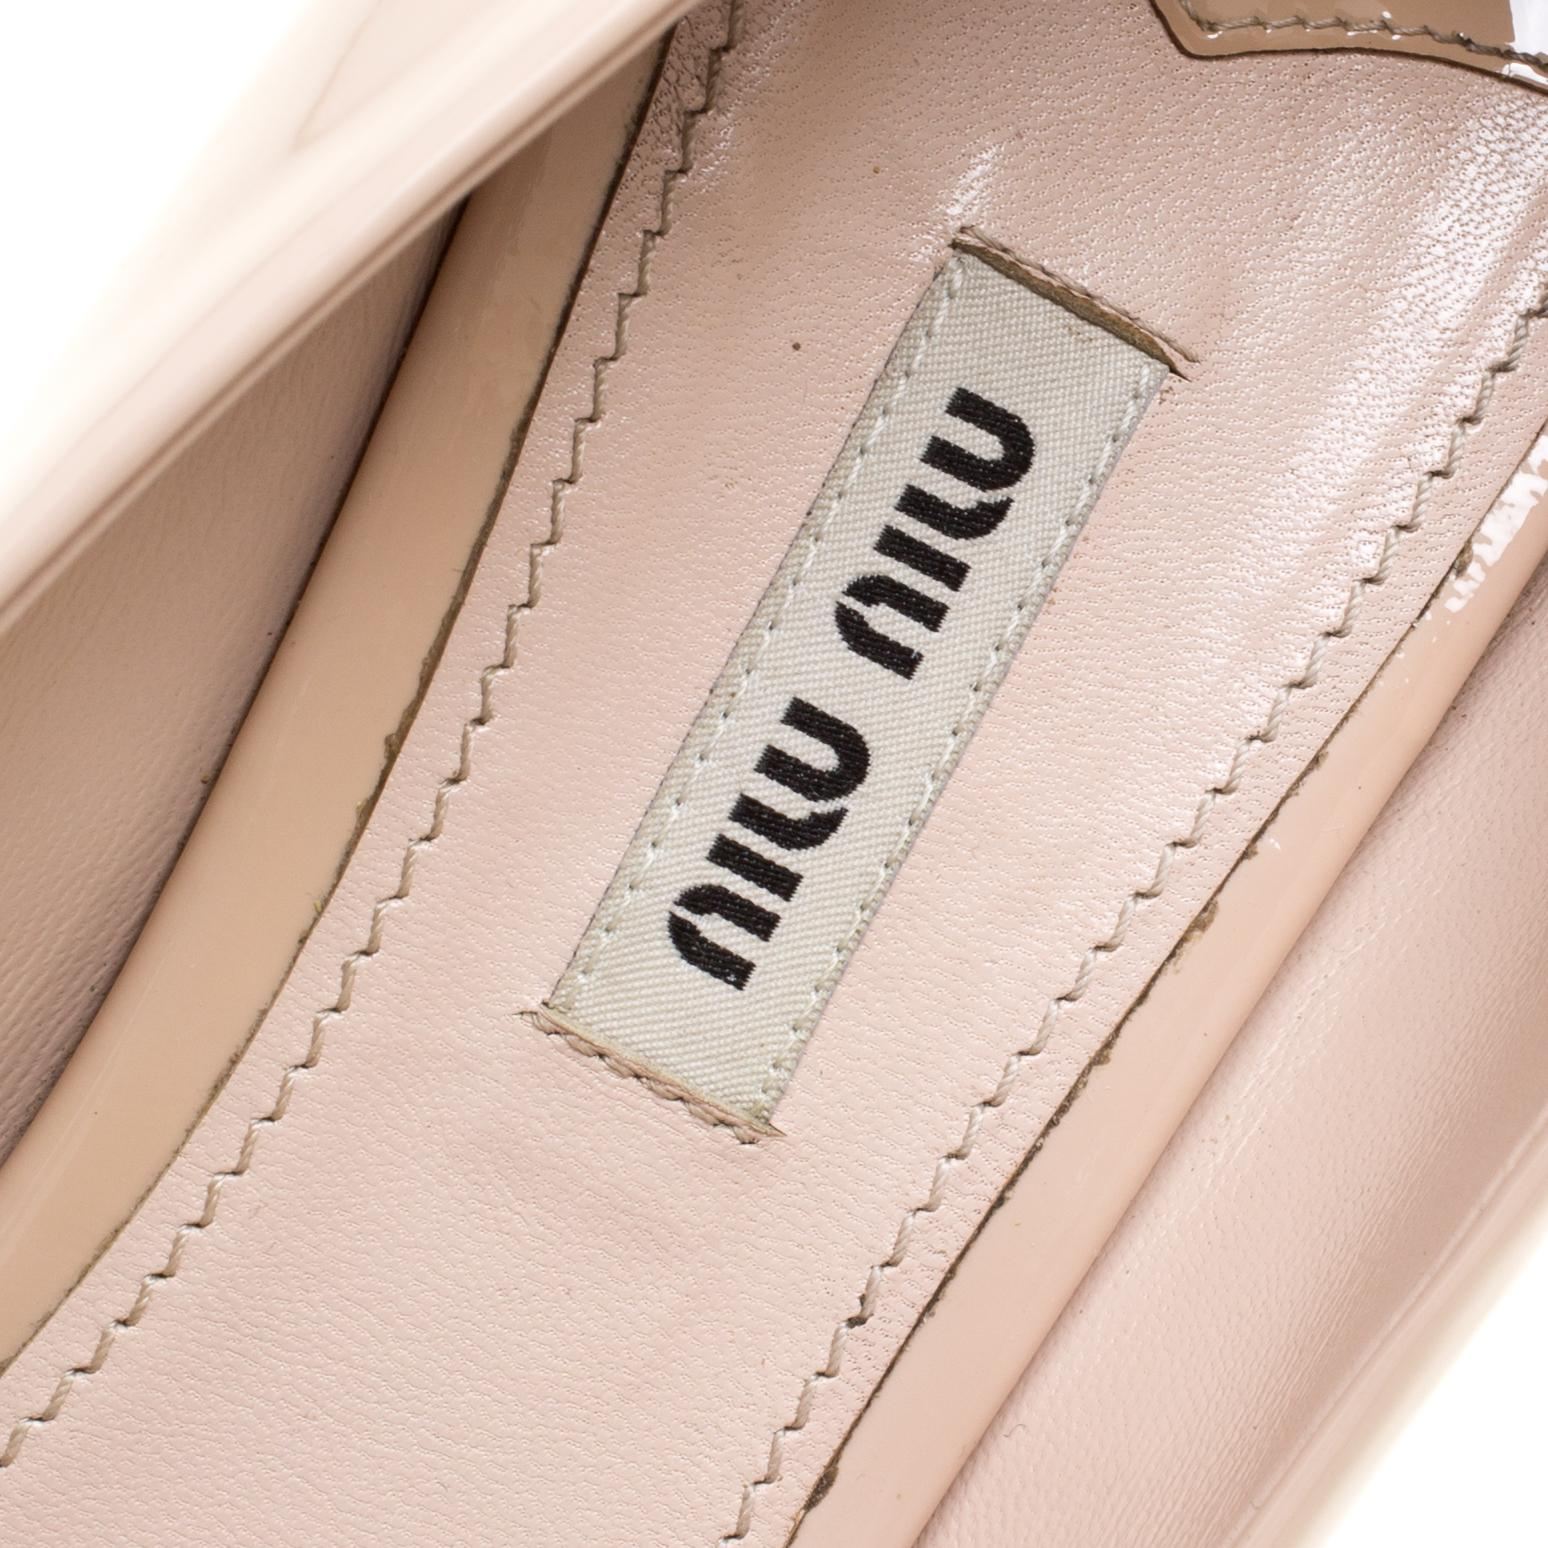 0204f26f5dc Miu Miu Beige Leather Crystal Embellished Block Heel Peep Toe Pumps Size 40  For Sale at 1stdibs